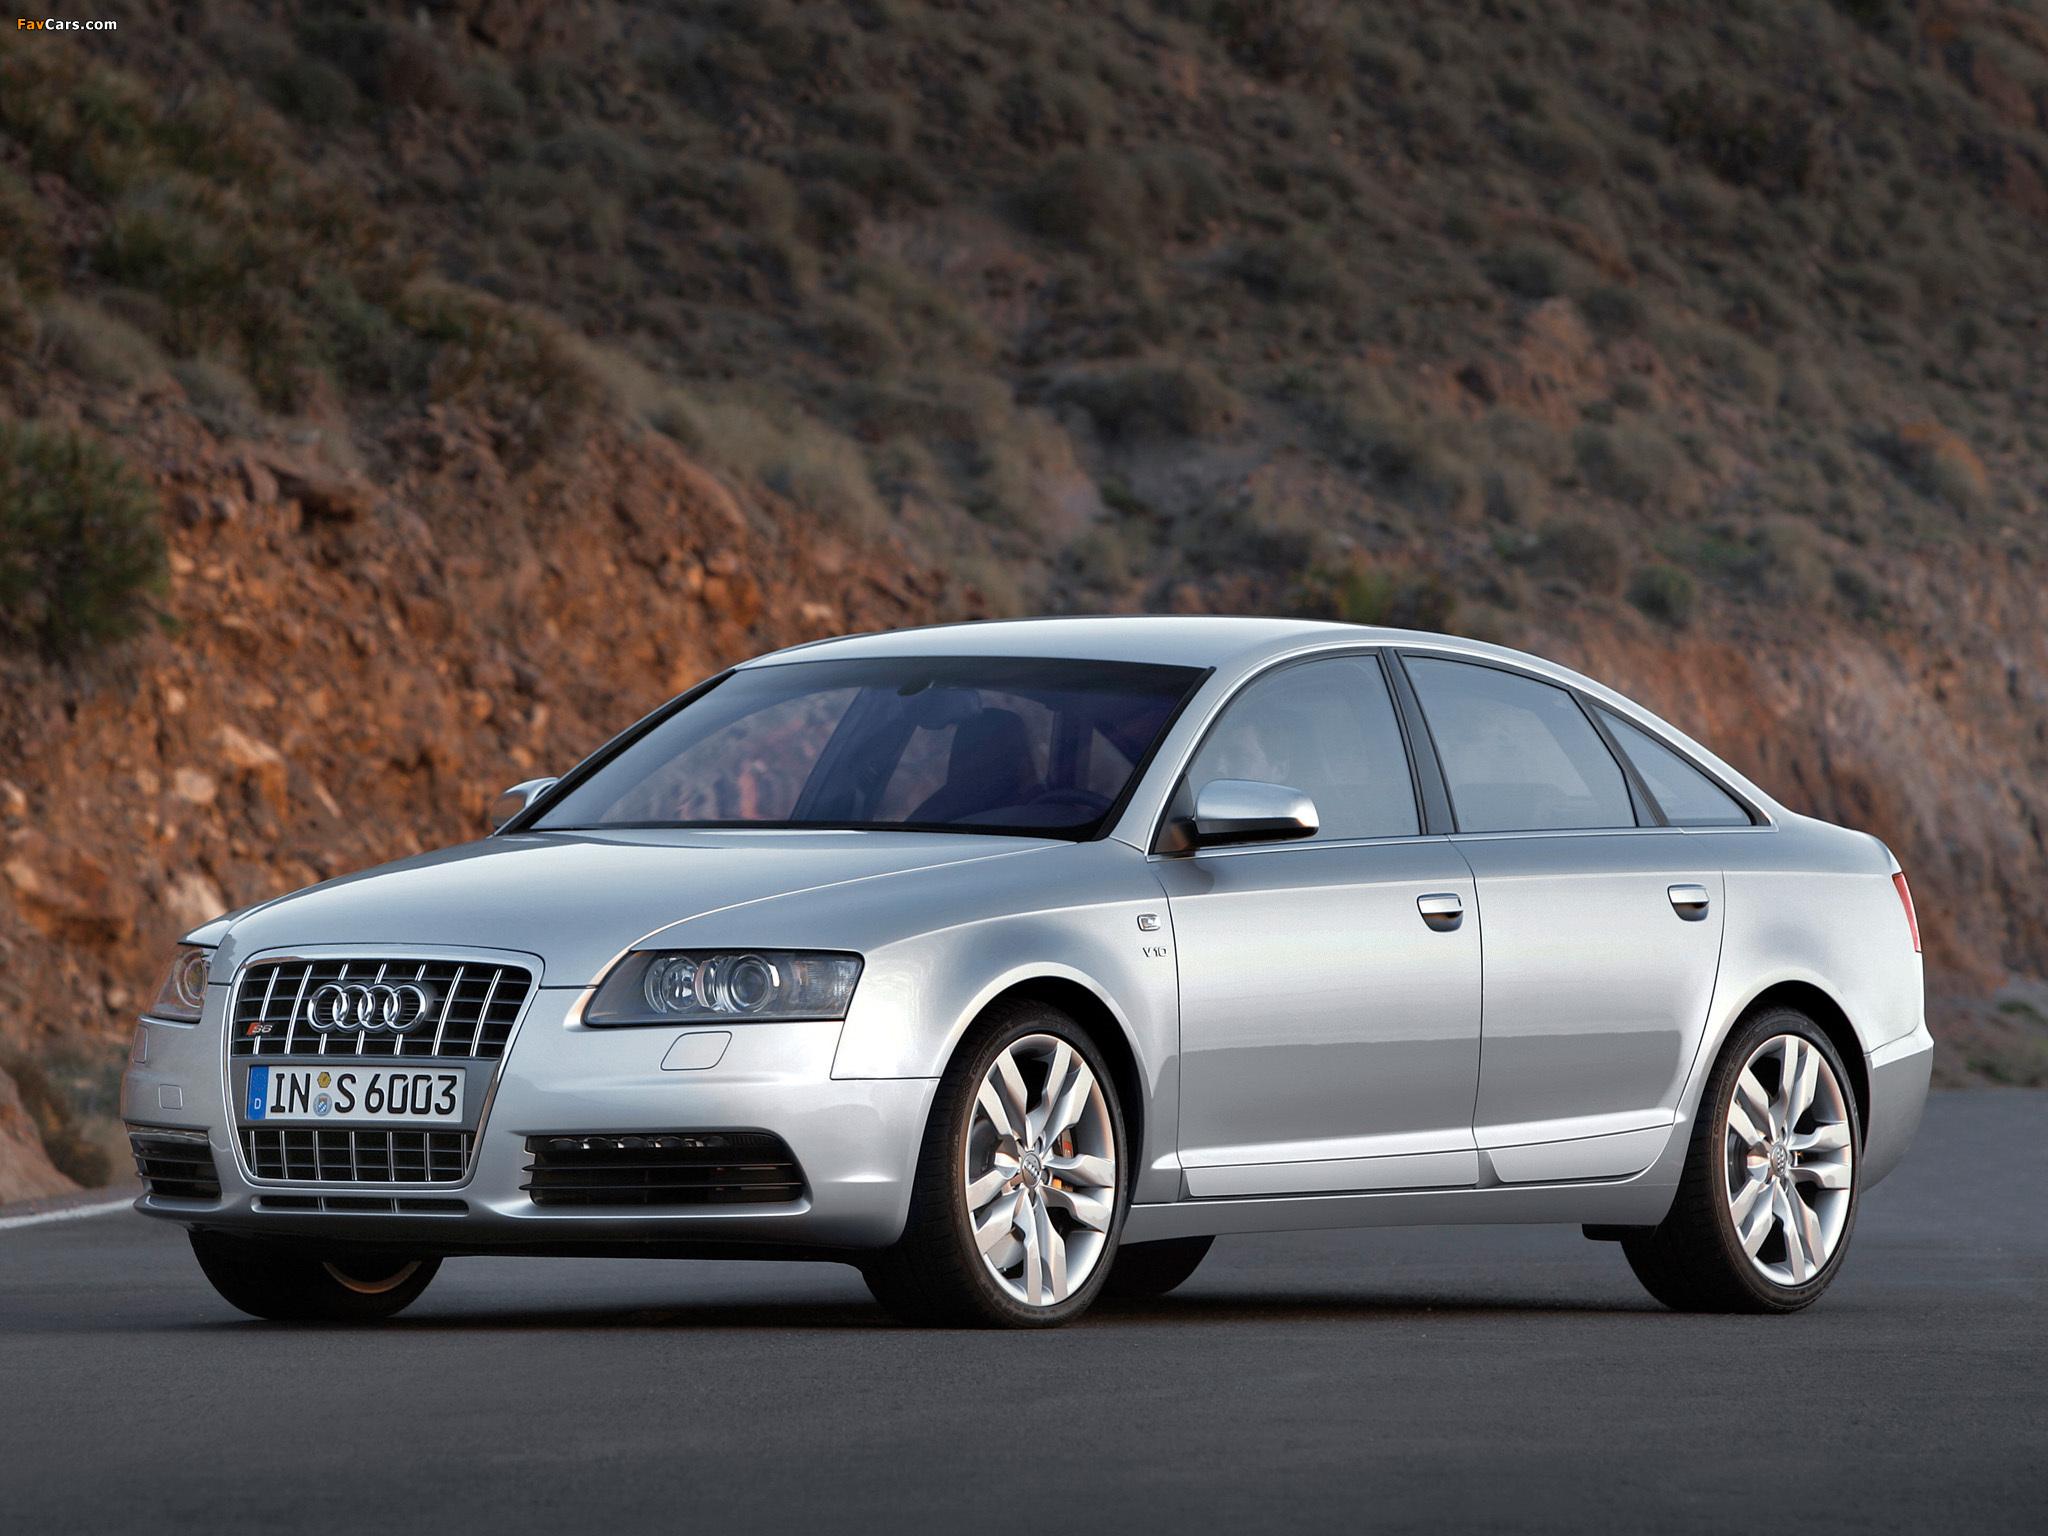 Photos Of Audi S6 Sedan 4fc6 200608 2048x1536